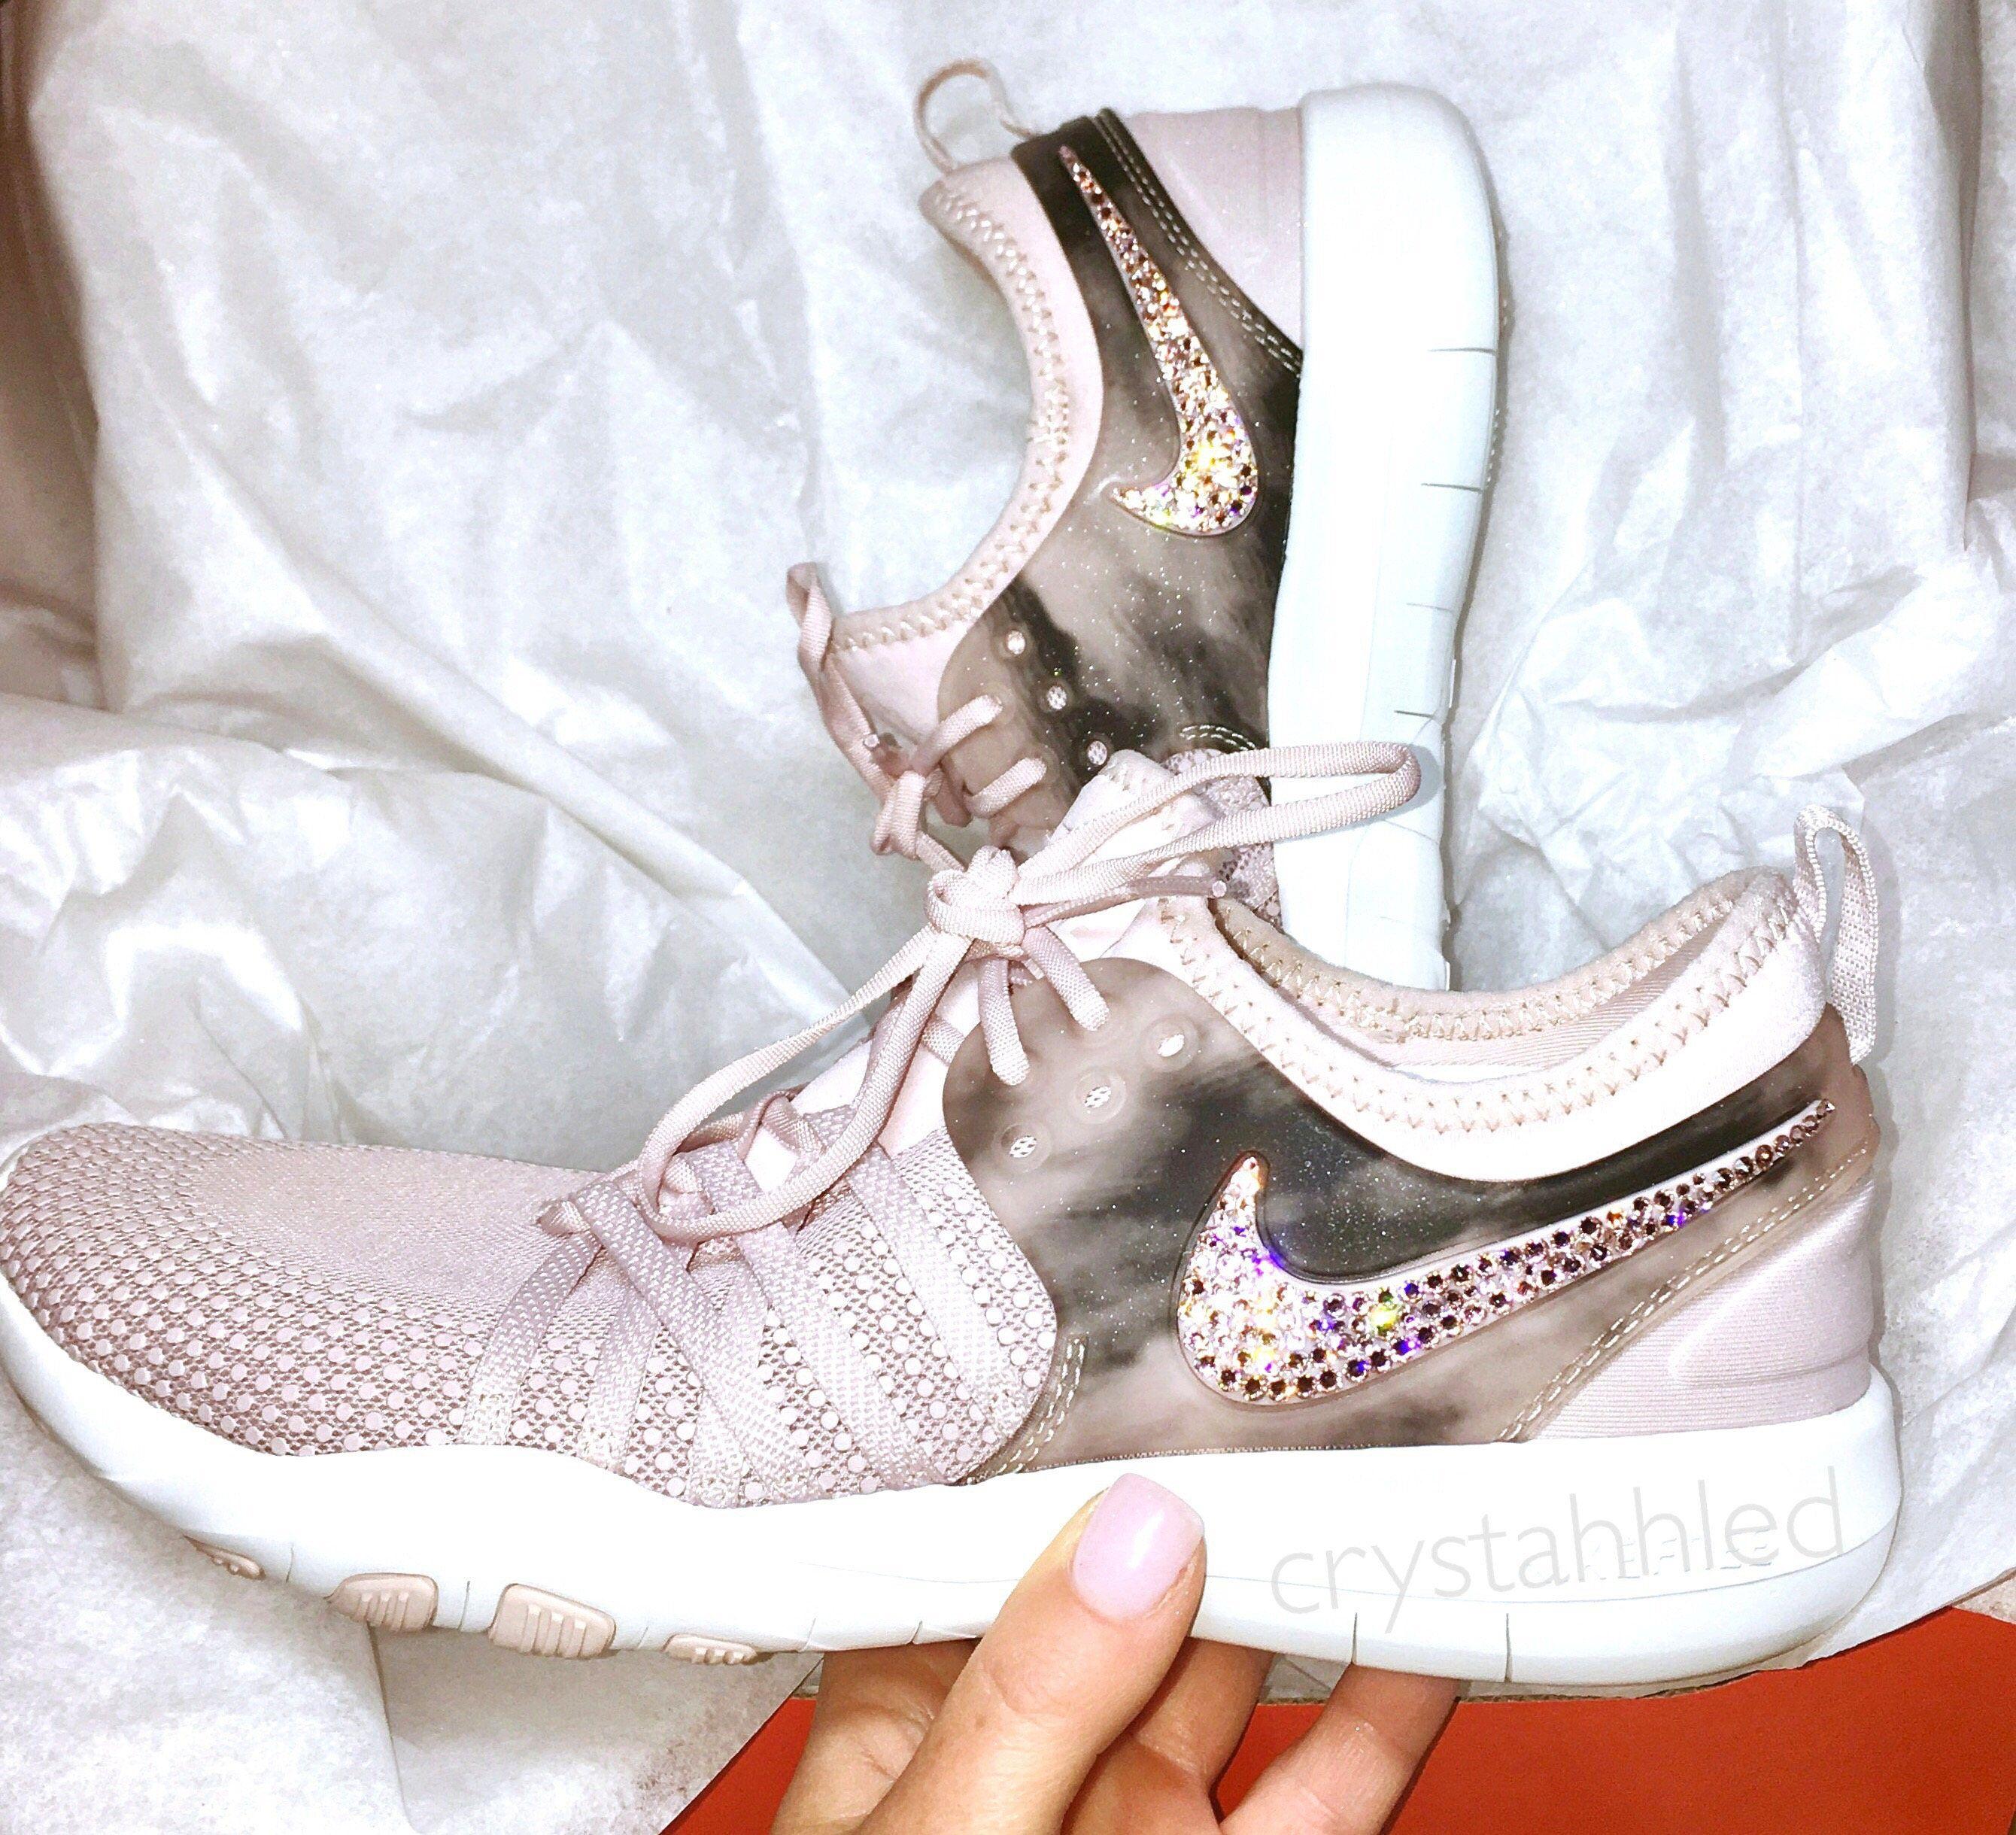 ... Nike Free TR 7 Amp - Bling - Perfect Gift - Nike Shoes - Crystahhled - Nike  Womens ... 7482fab7f9